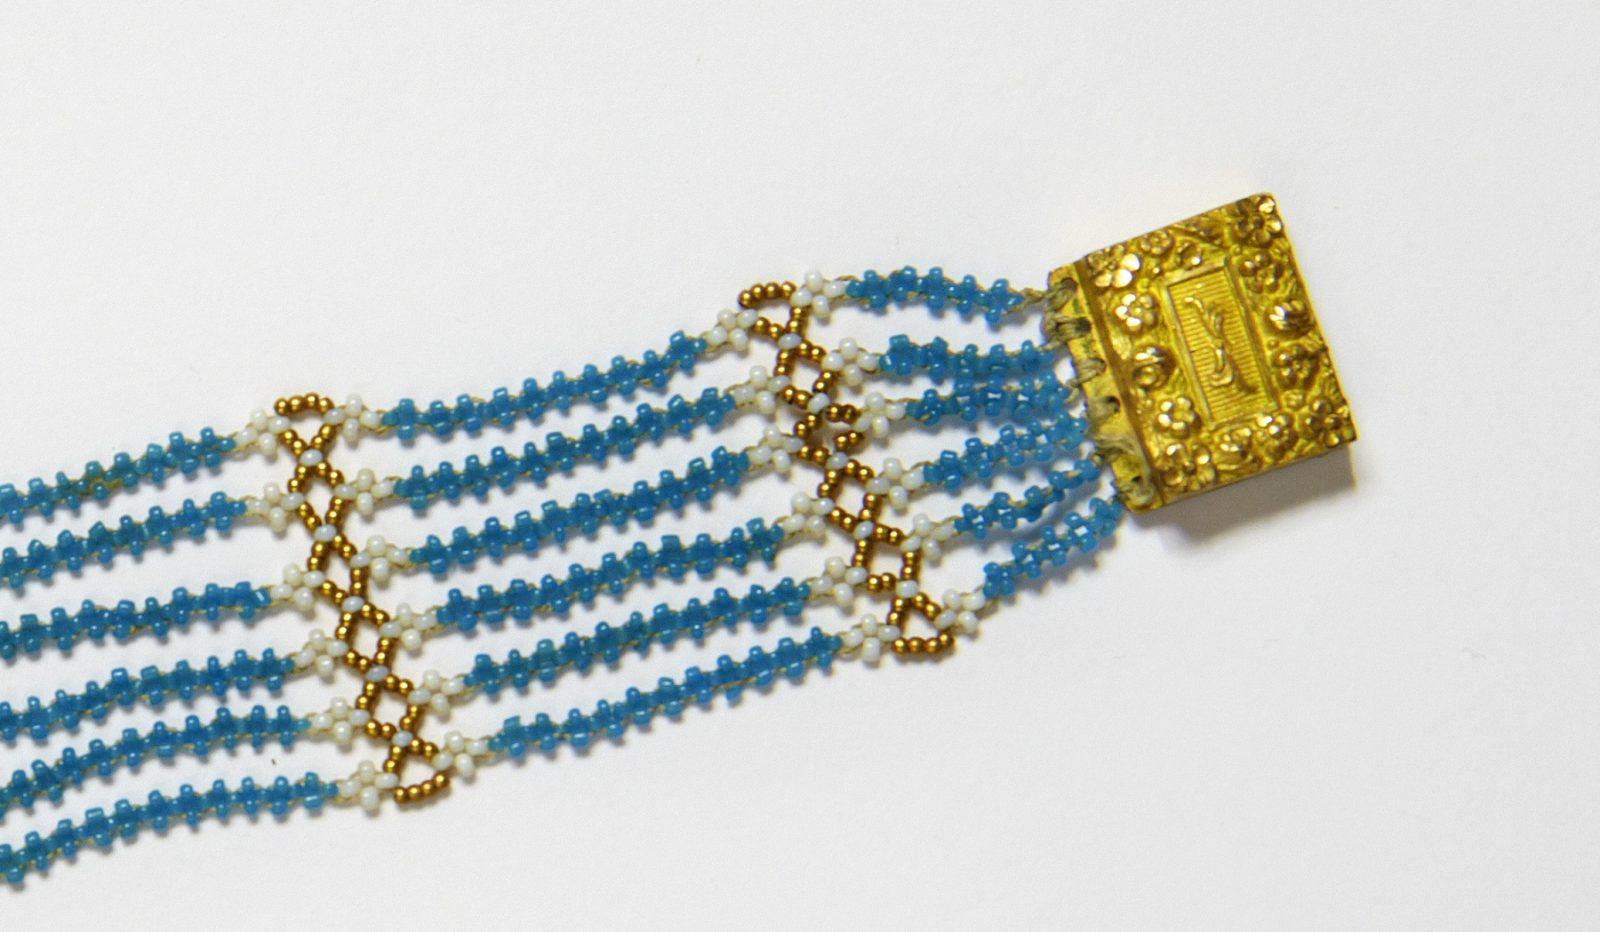 Close up of Jane Austen's blue bead bracelet